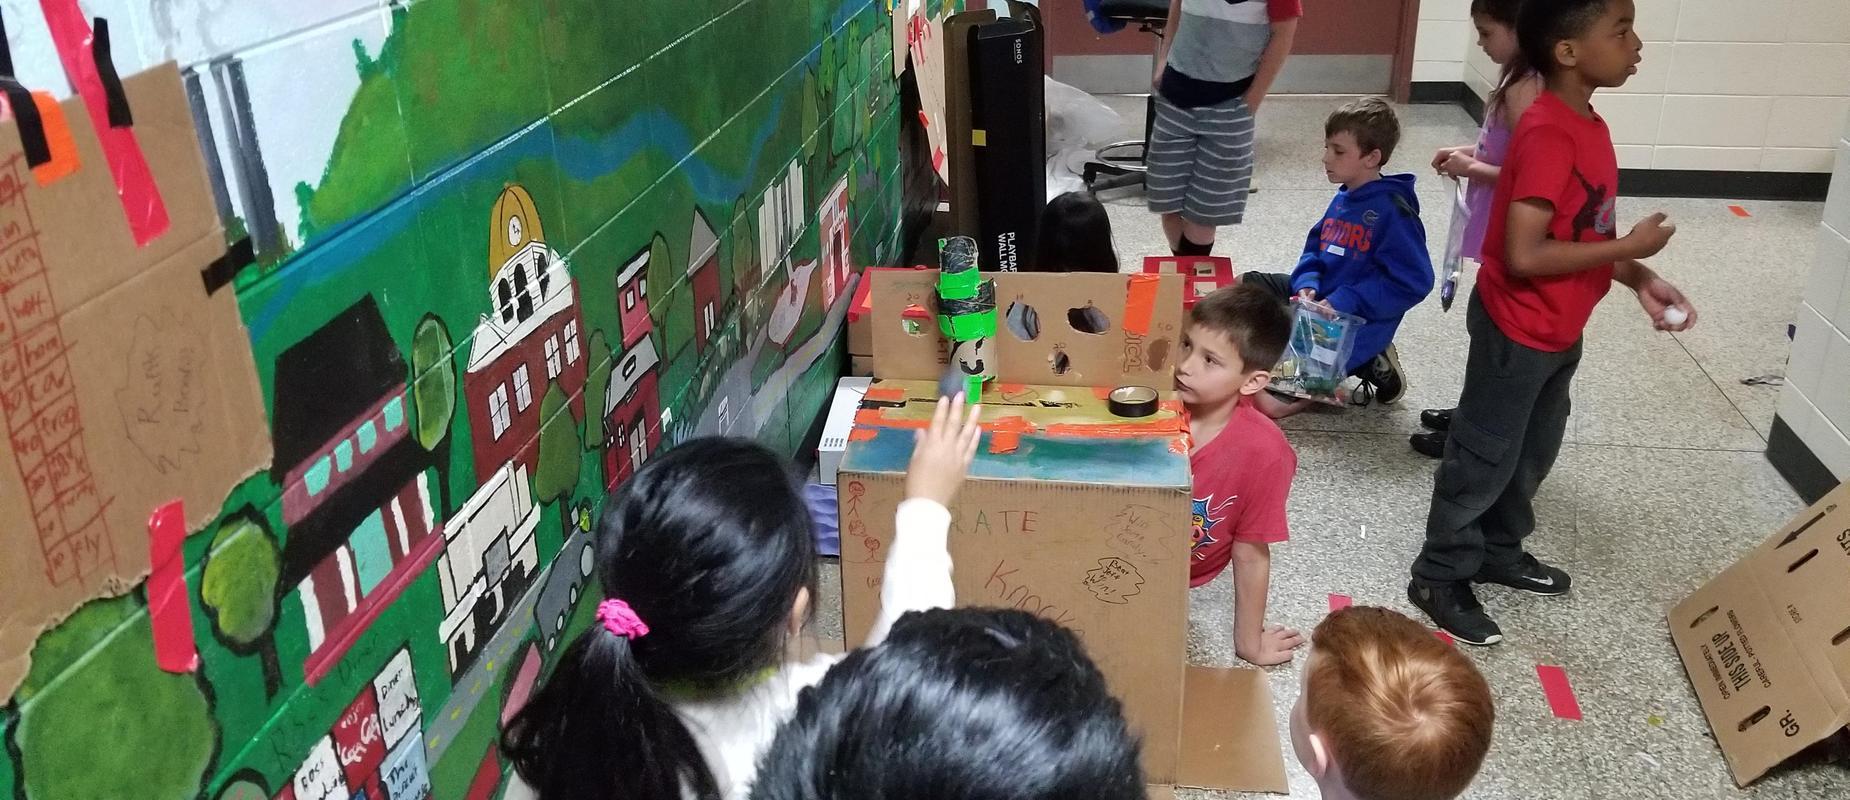 Caine's Arcade Day